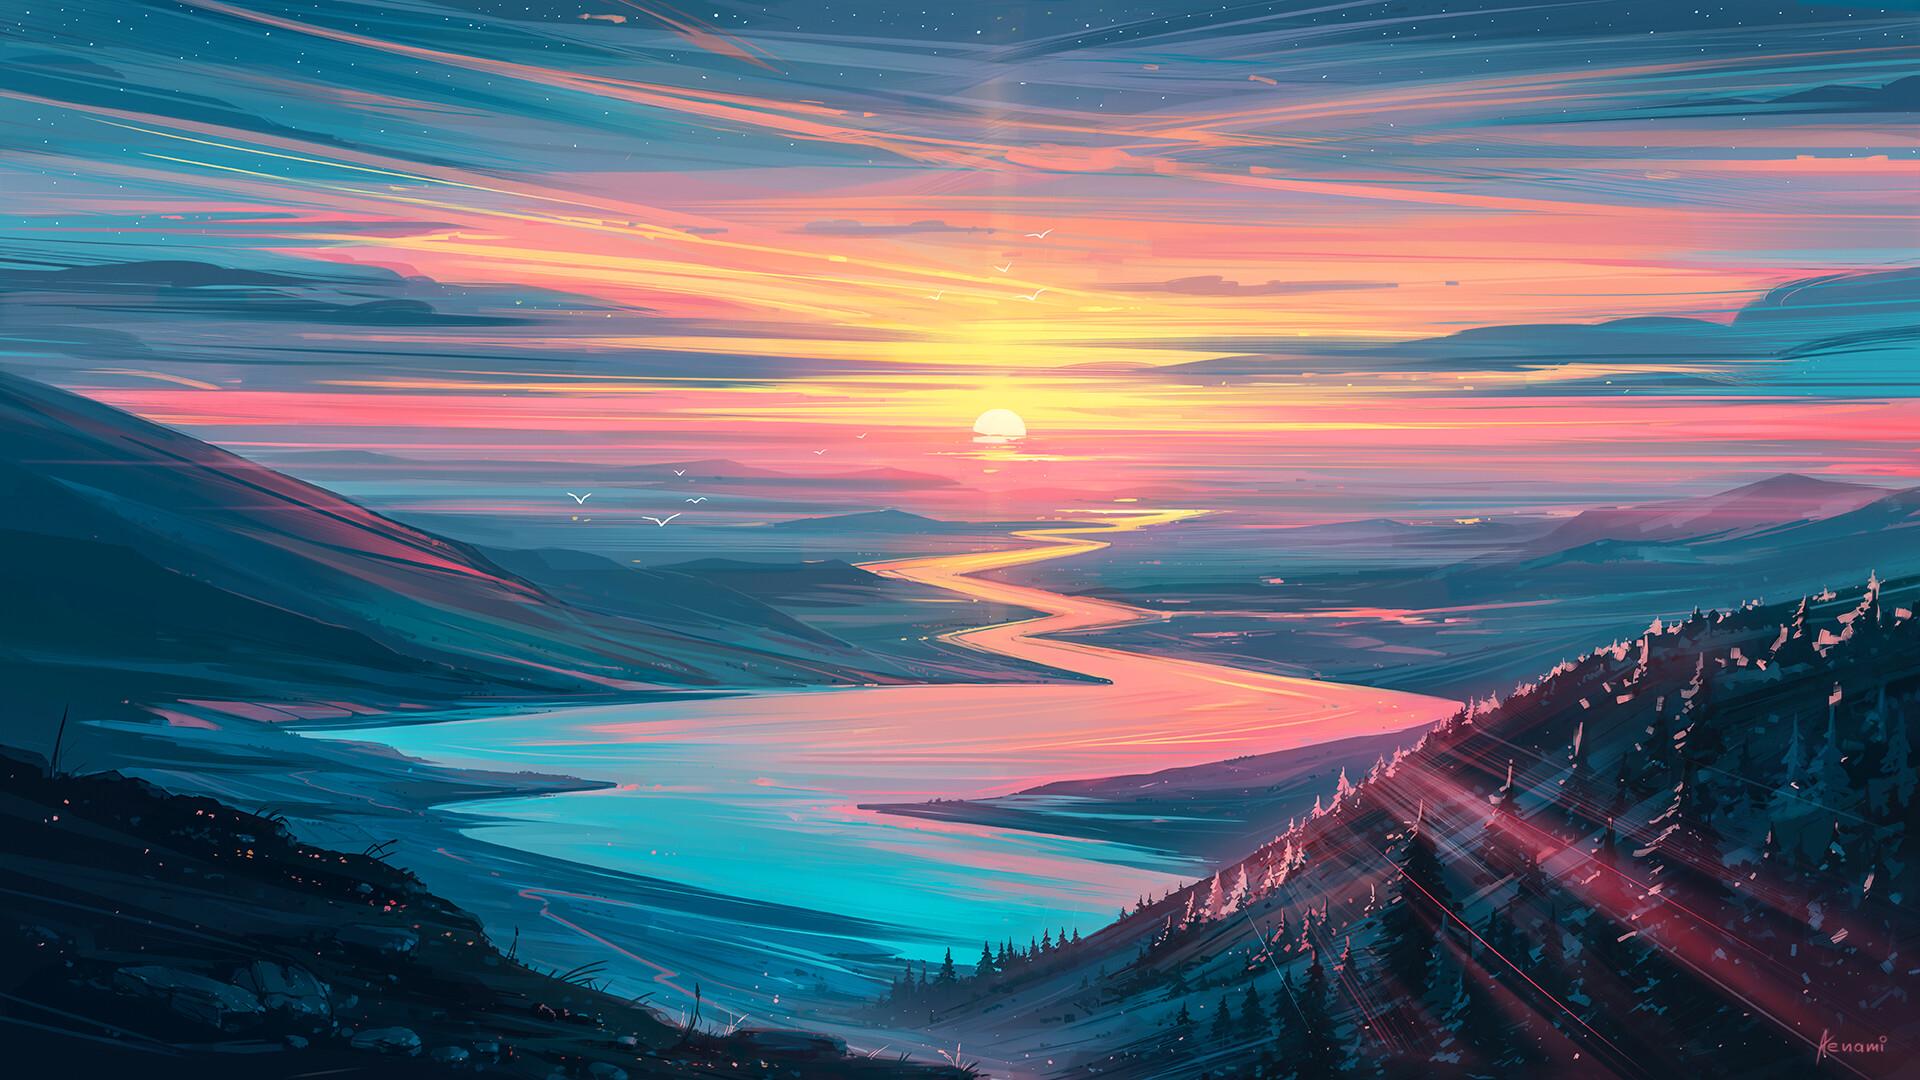 Sunrise Landscape Wallpaper, HD Artist 12K Wallpapers, Images ...